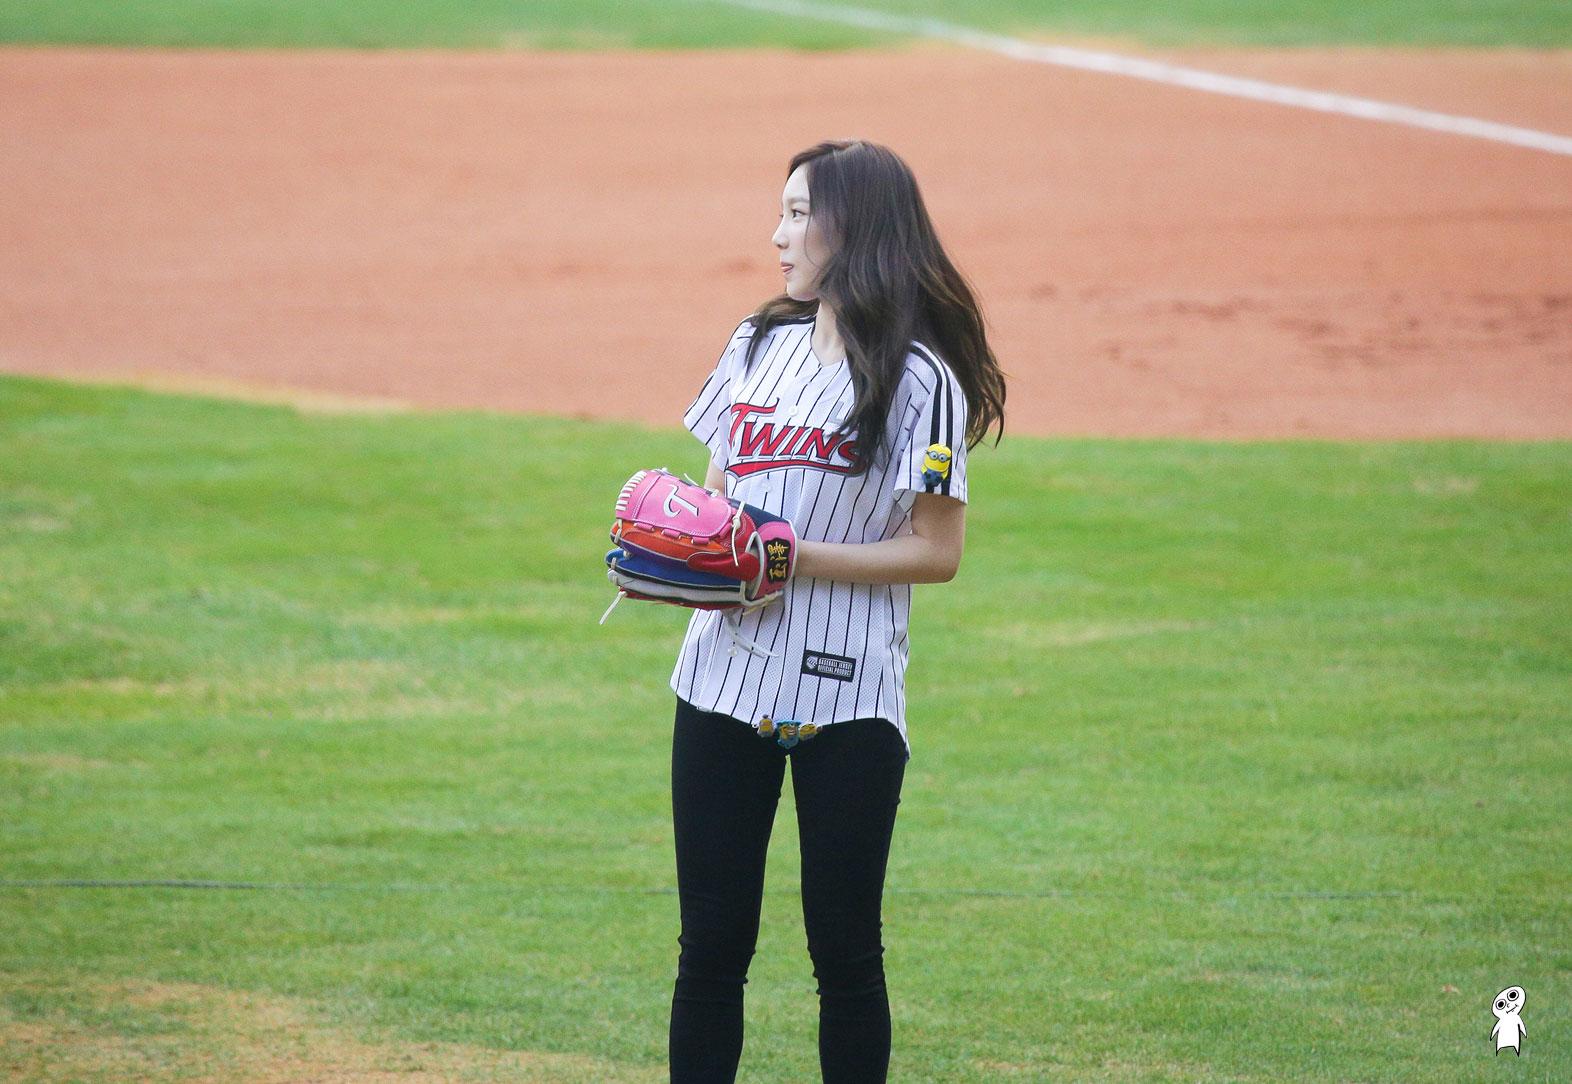 Girls Generation Taeyeon first pitch